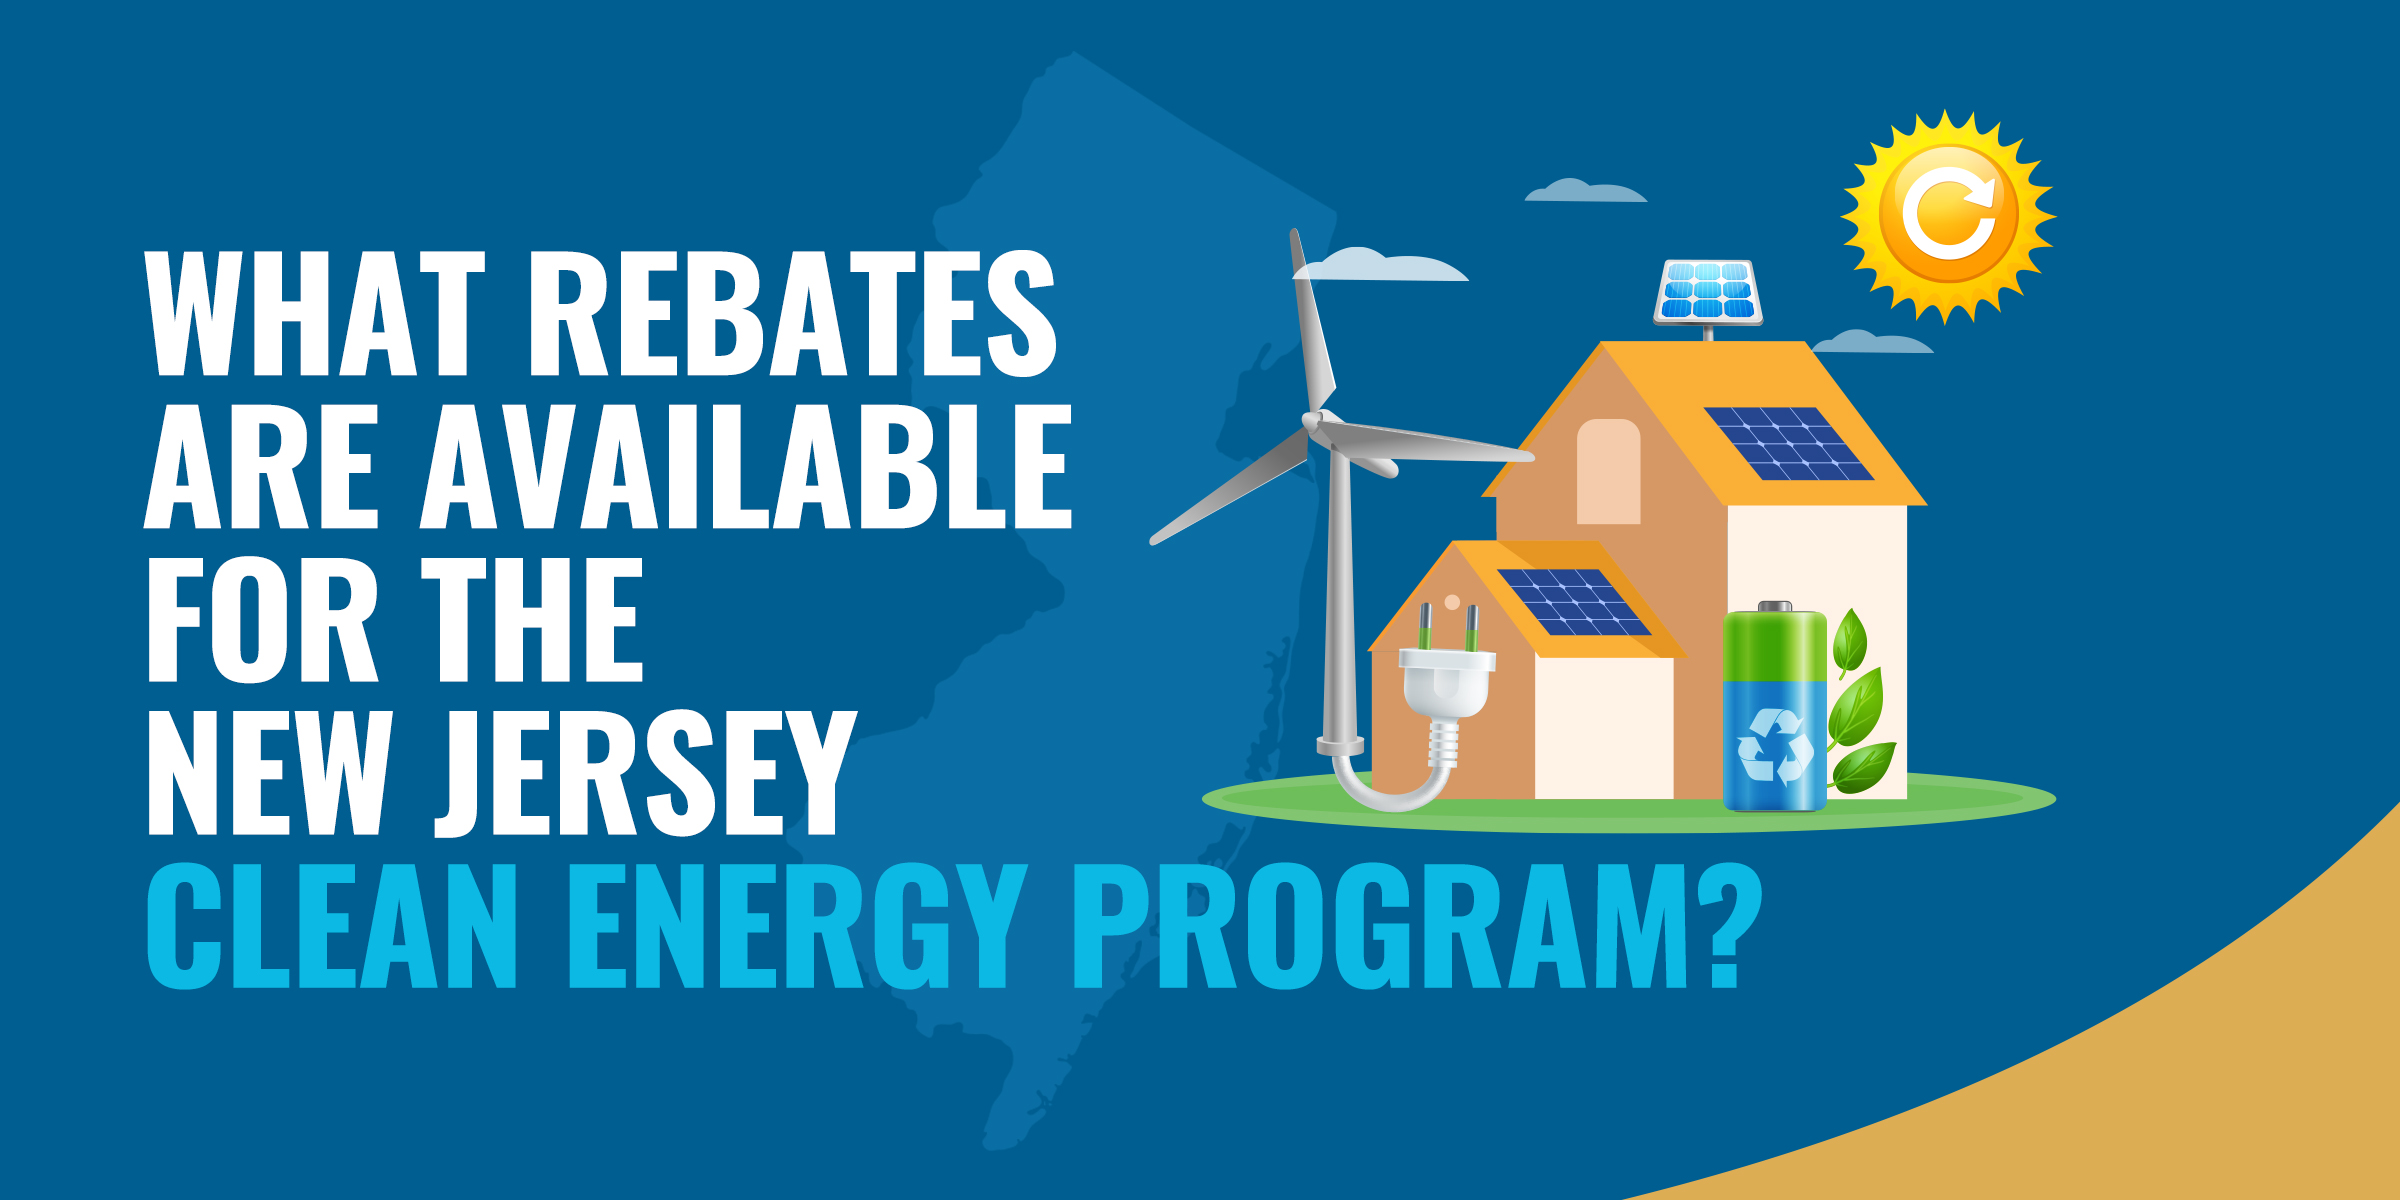 New Jersey Clean Energy Program Rebates